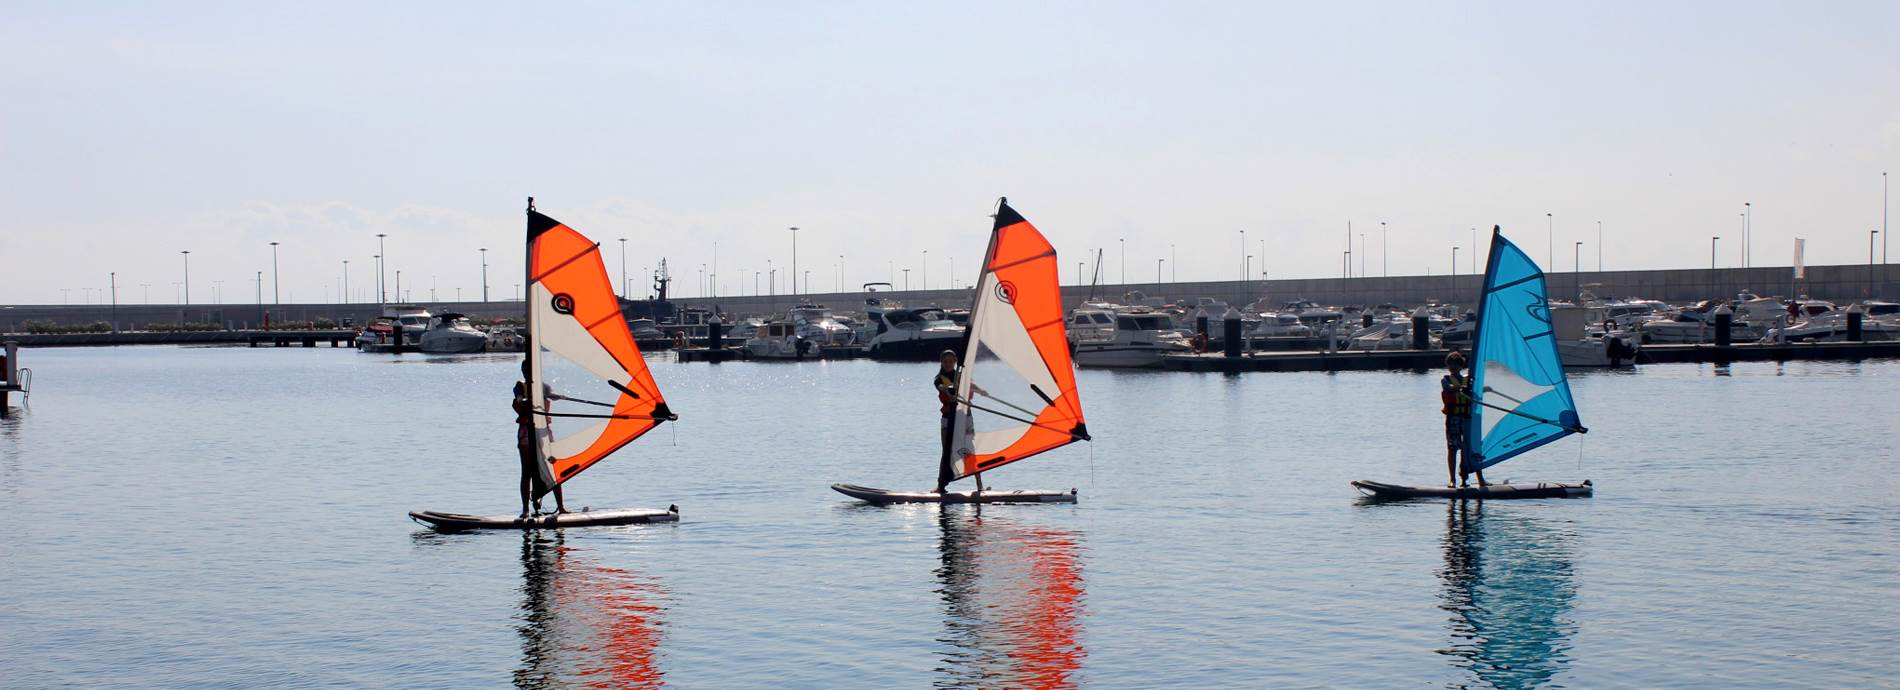 windsurf-valencia.jpg